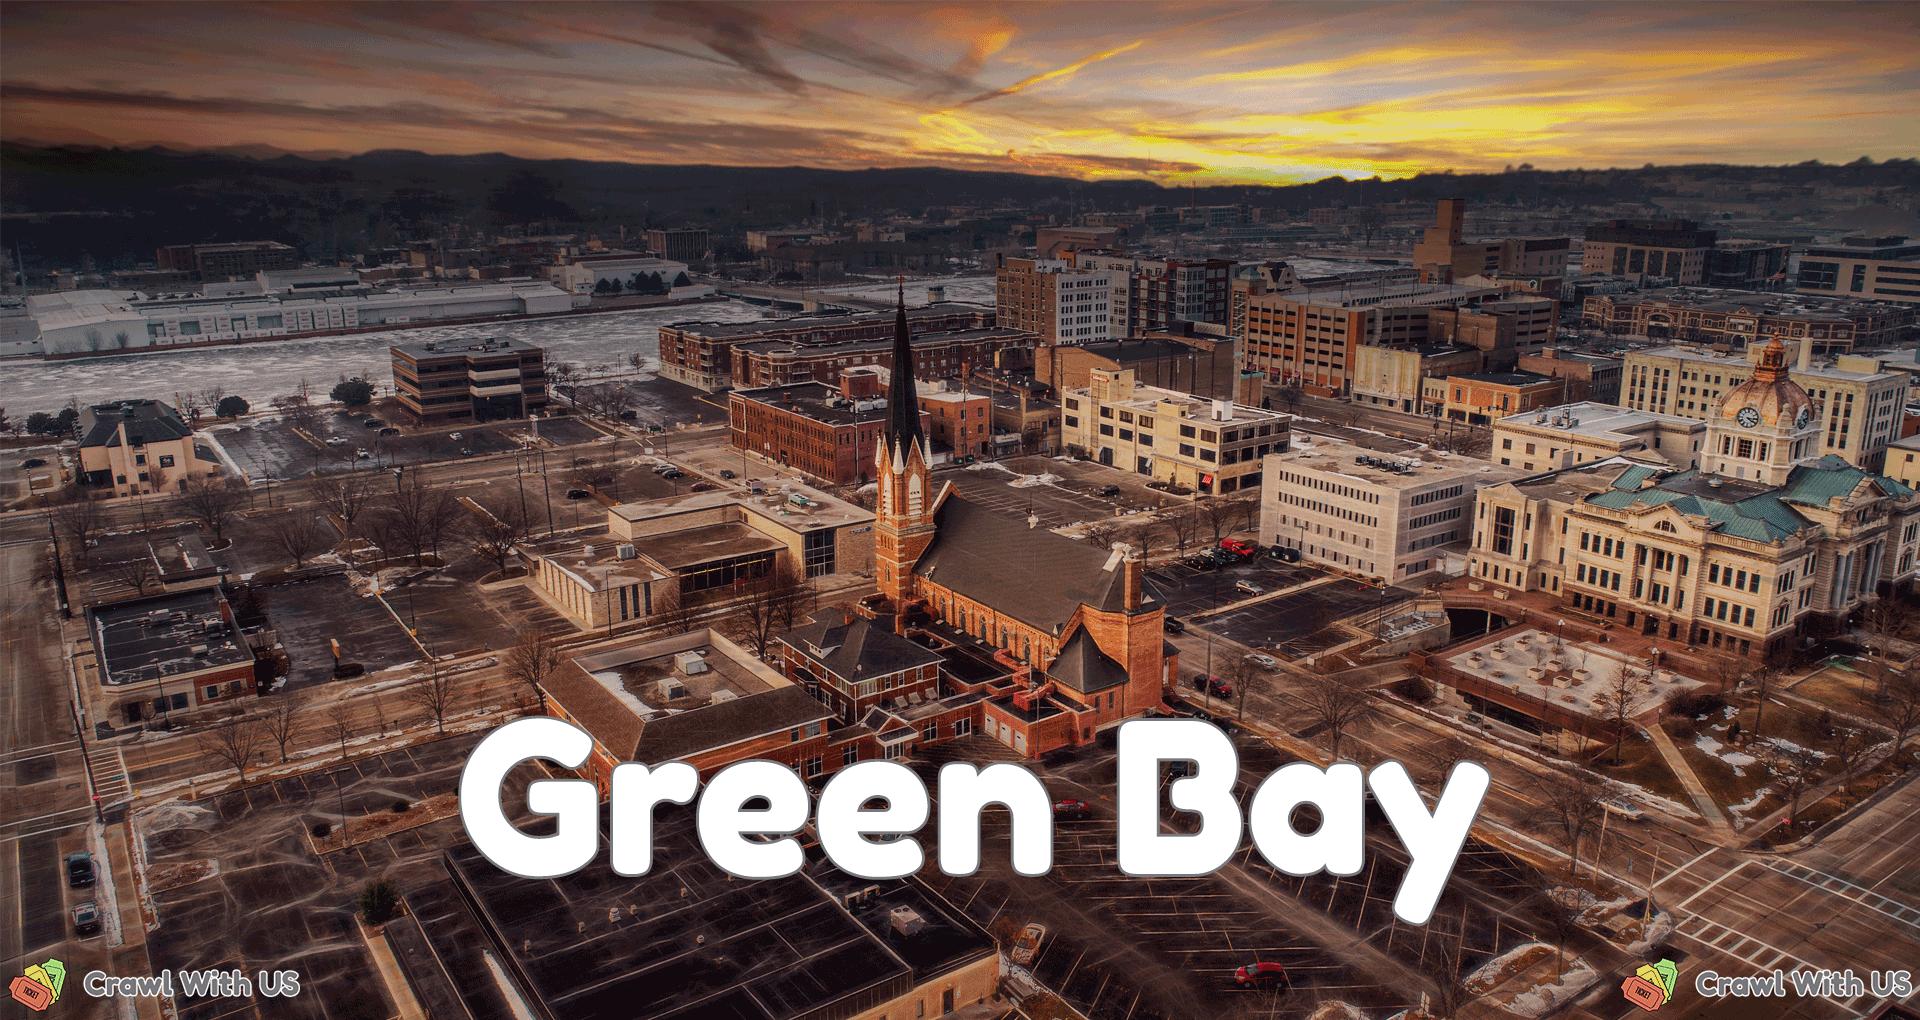 Green Bay Bar Crawls